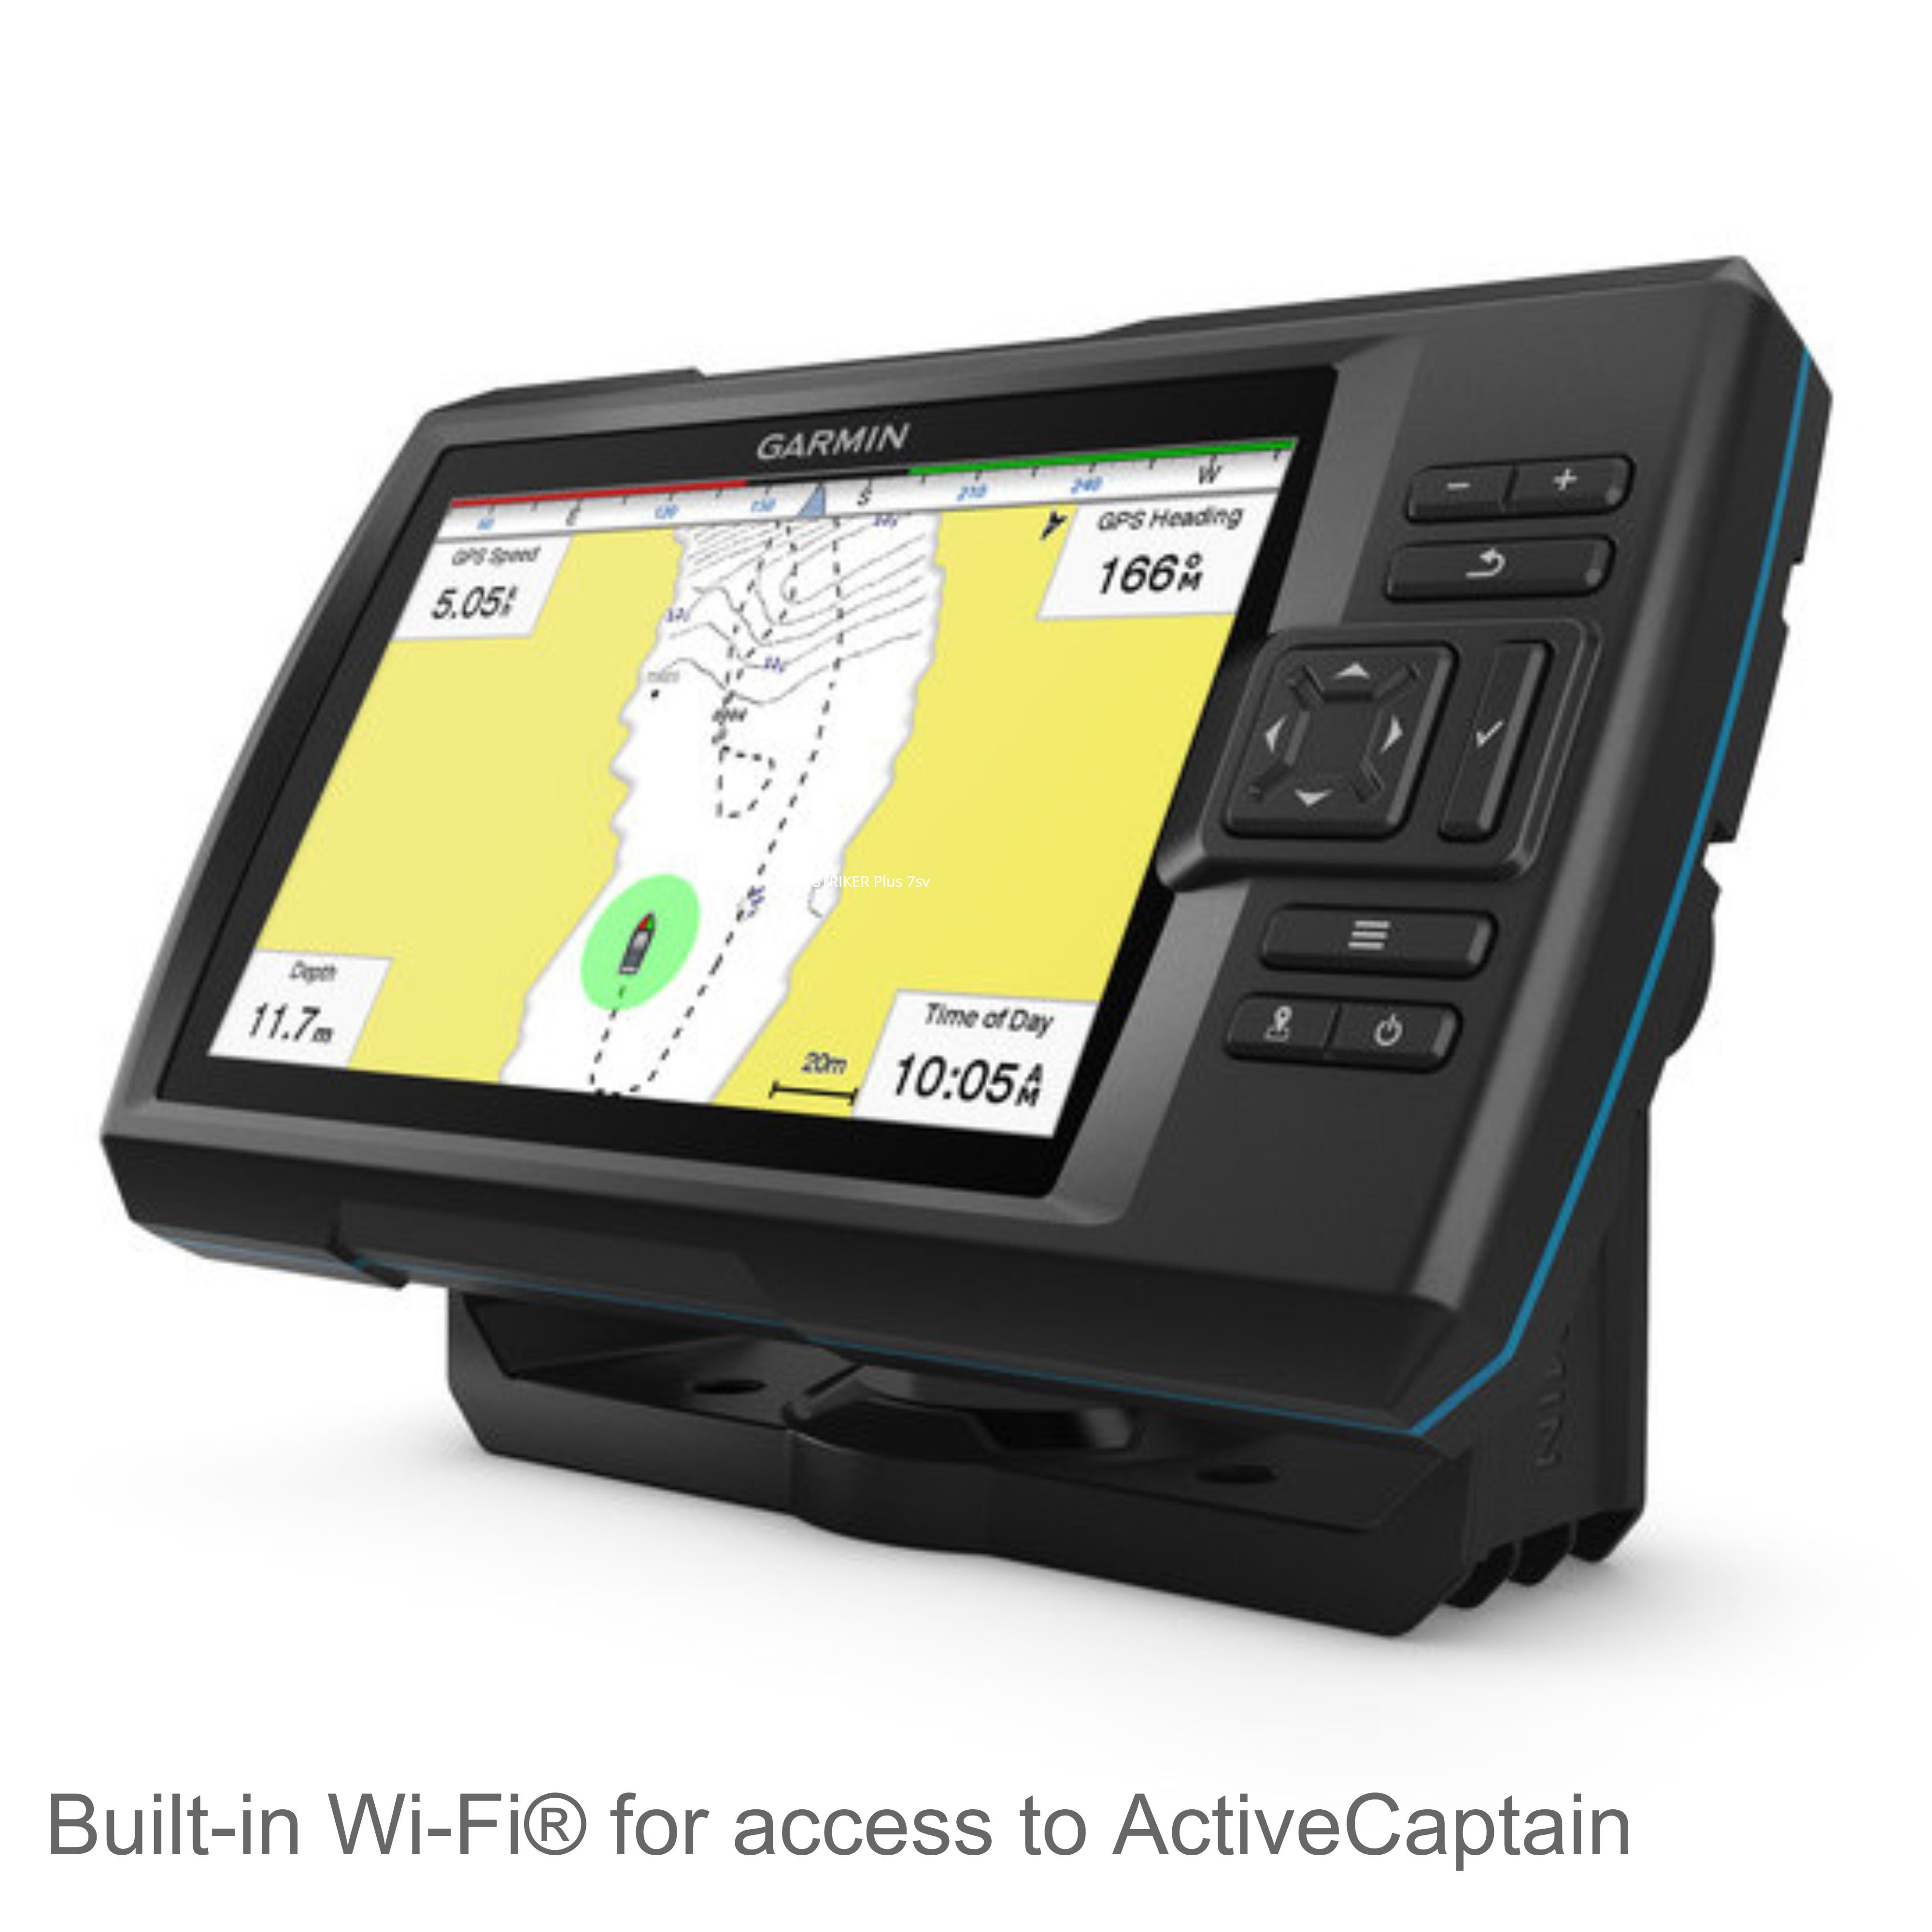 Garmin striker plus 7sv waterproof gps fish finder marine for Fish finder apps